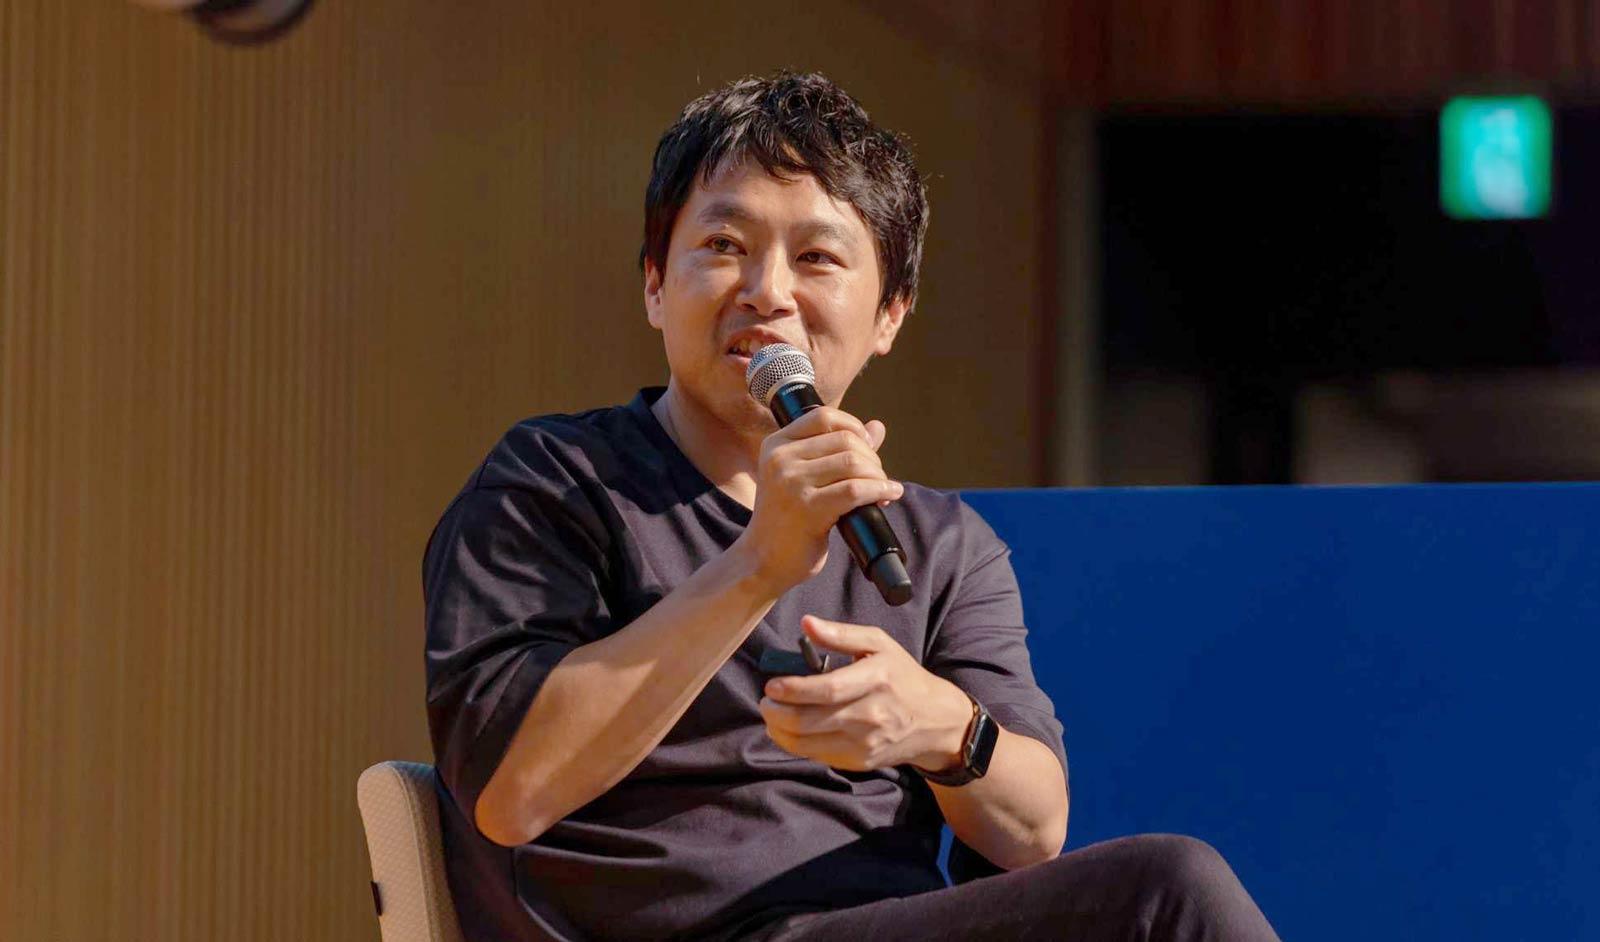 ブライトコーブ株式会社 VP, Business Development 北庄司 英雄氏